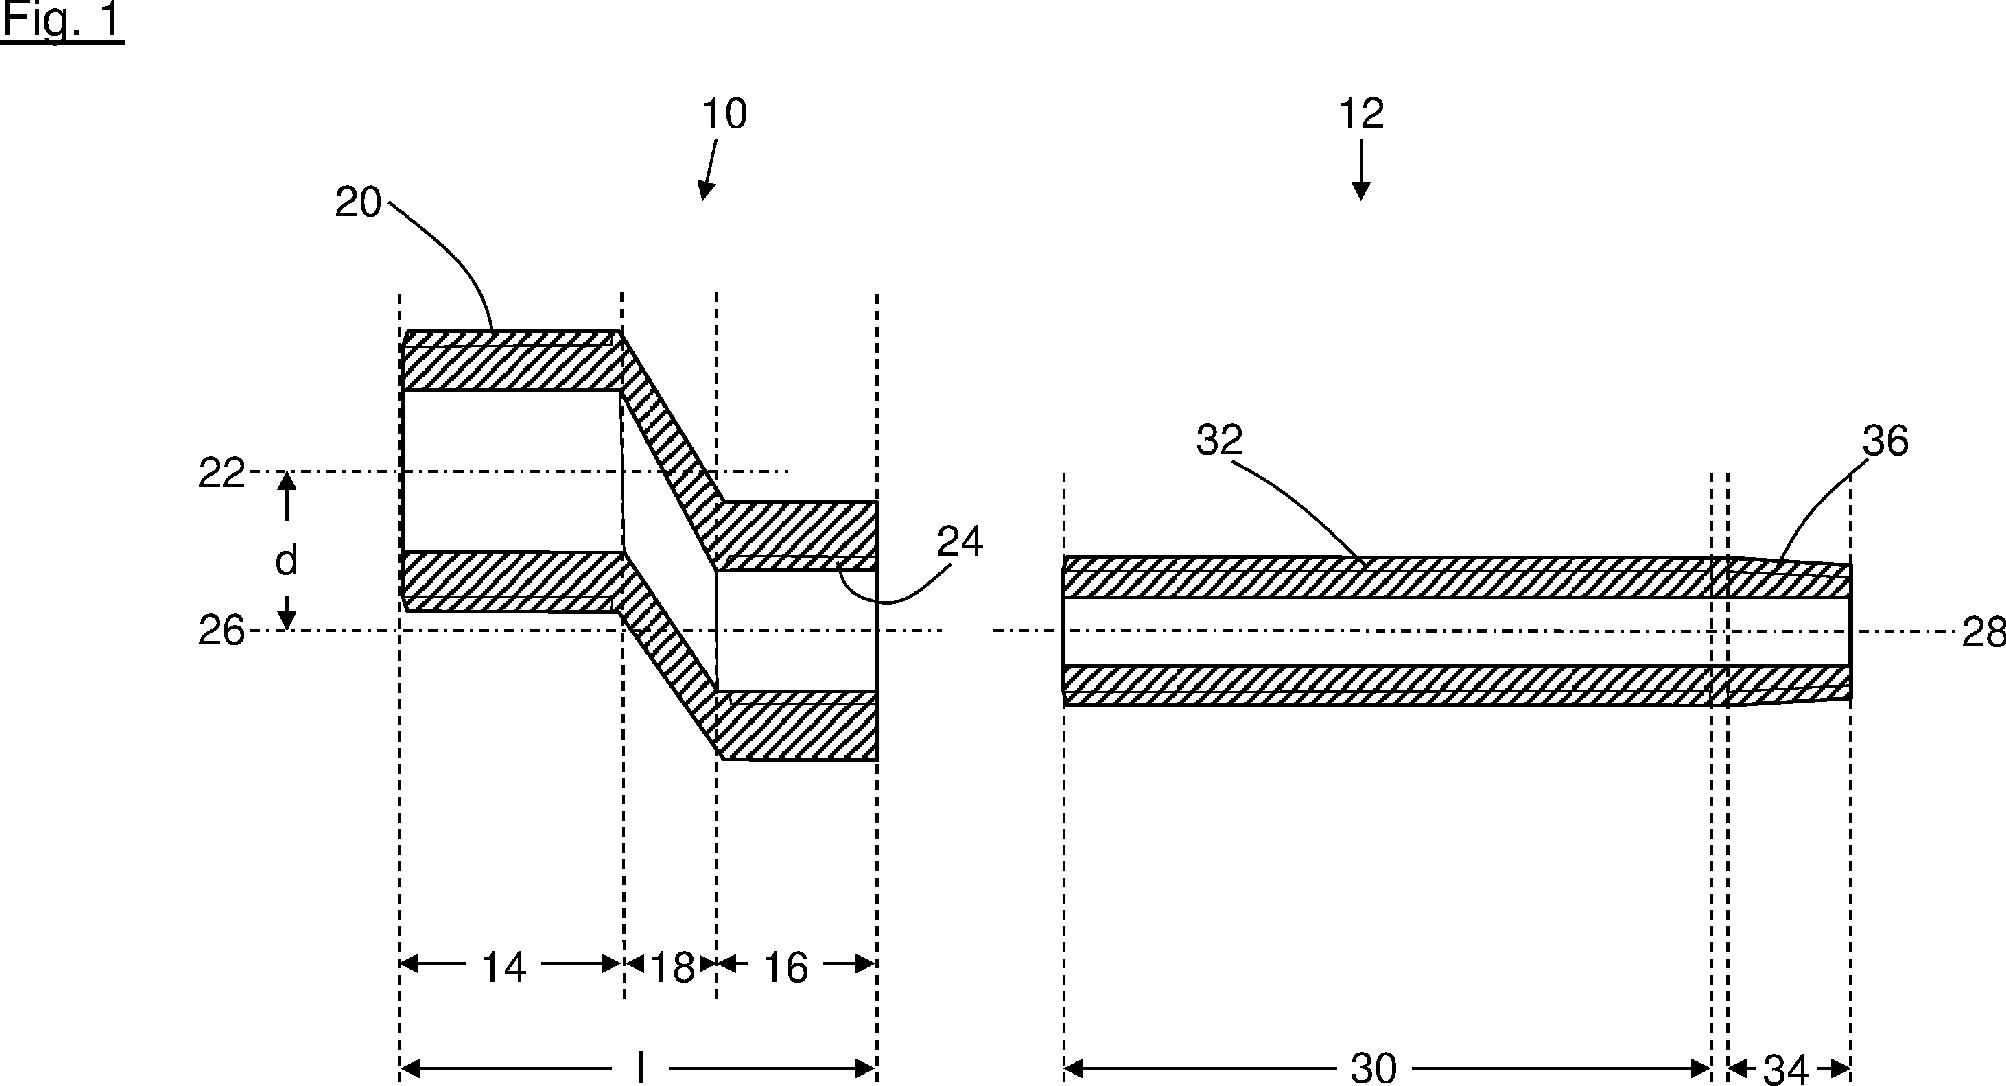 patent de202015102160u1 s anschluss zum anschlie en. Black Bedroom Furniture Sets. Home Design Ideas